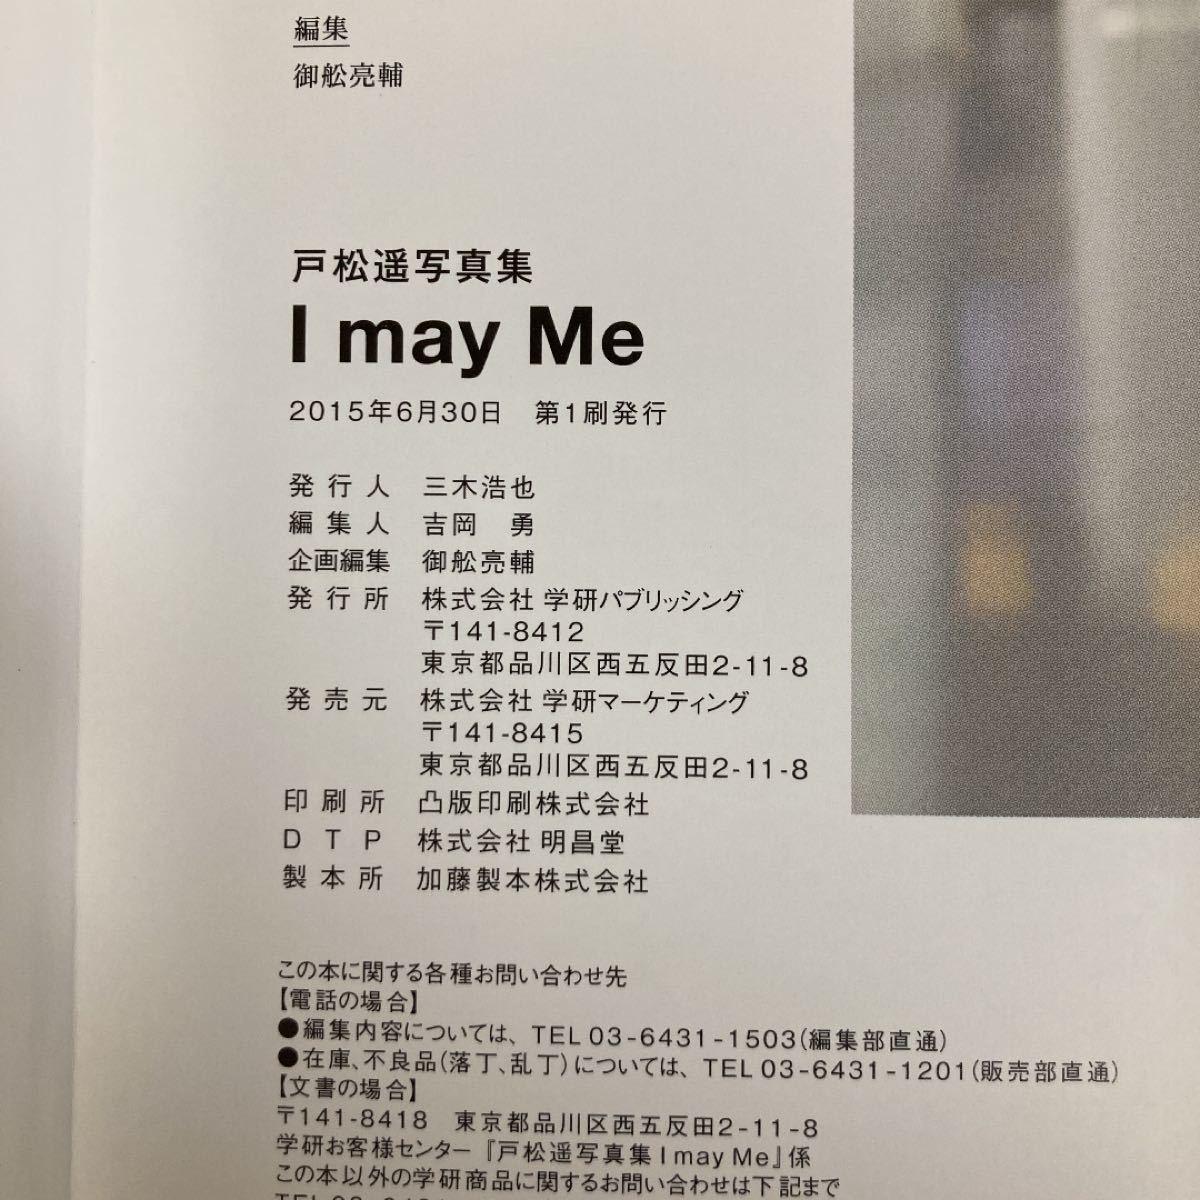 帯付き初版美品! 戸松遙写真集 I may Me/戸松遥河野英喜